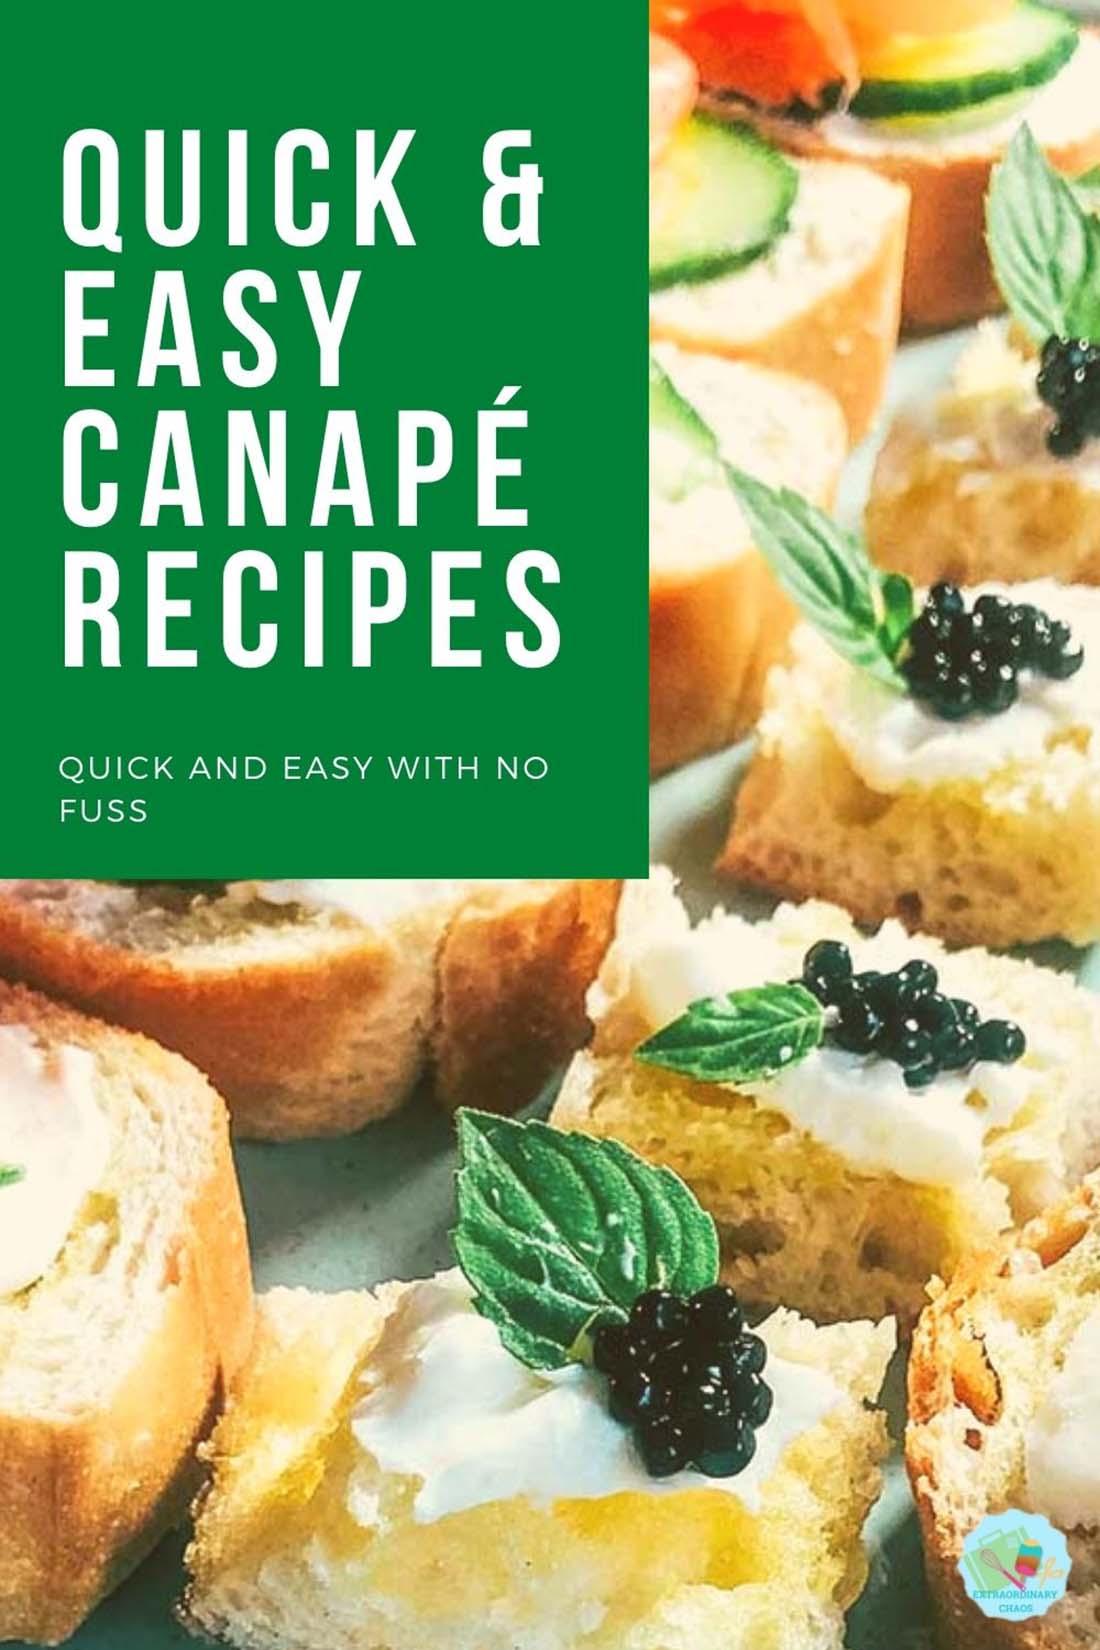 Easy Canapé Recipes For Christmas Day